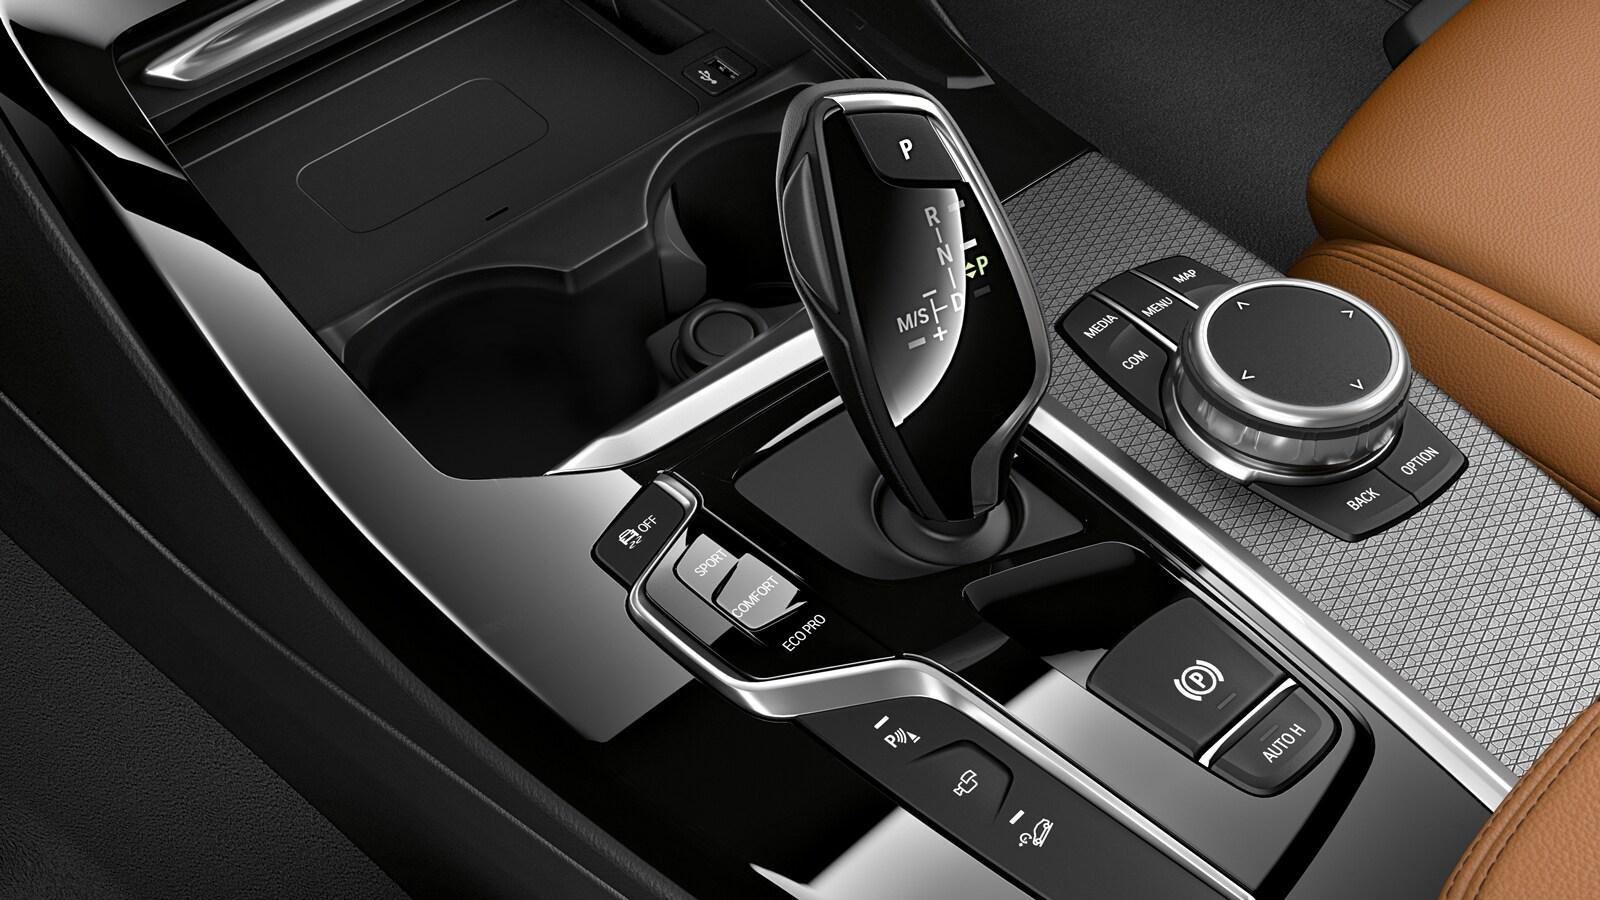 2020 BMW X3 Center Console